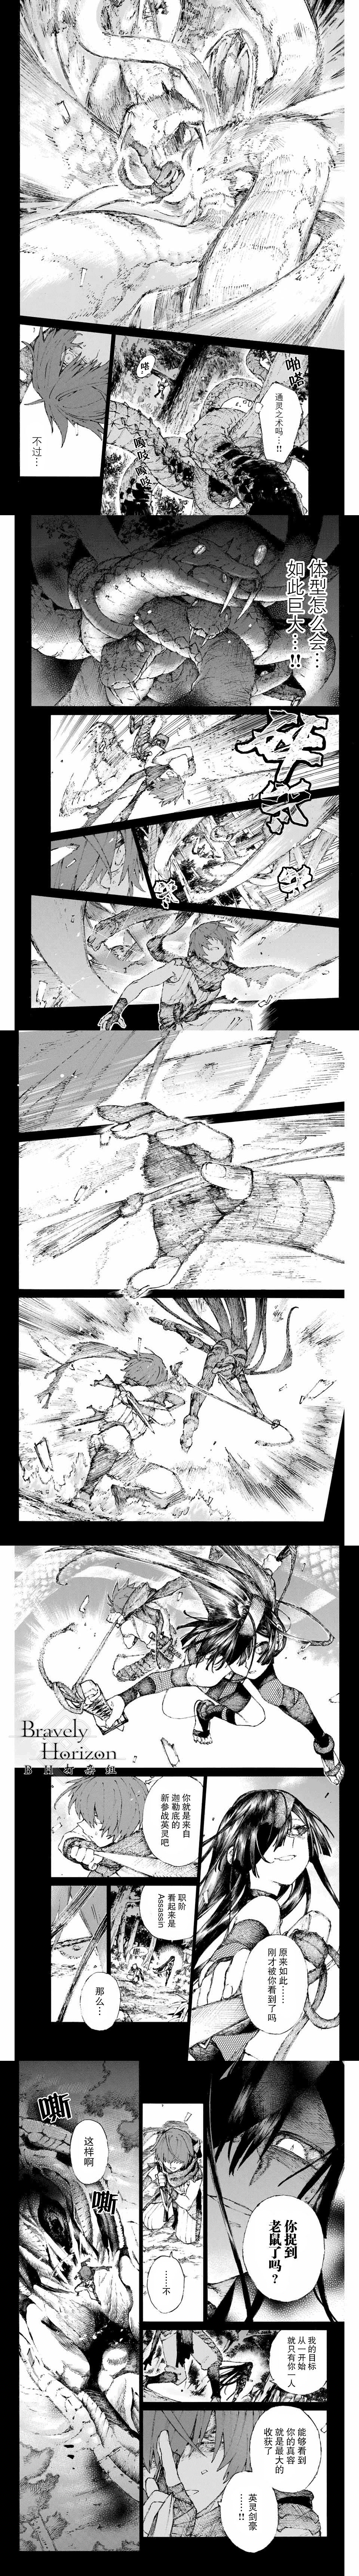 Fate Grand Order 短篇漫画 1.5.3 亚种特异点III 尸山血河舞台 下总国 英灵剑豪七番决胜 第19话 女忍 Fate Grand Order Fate Grand Order 漫画 第2张